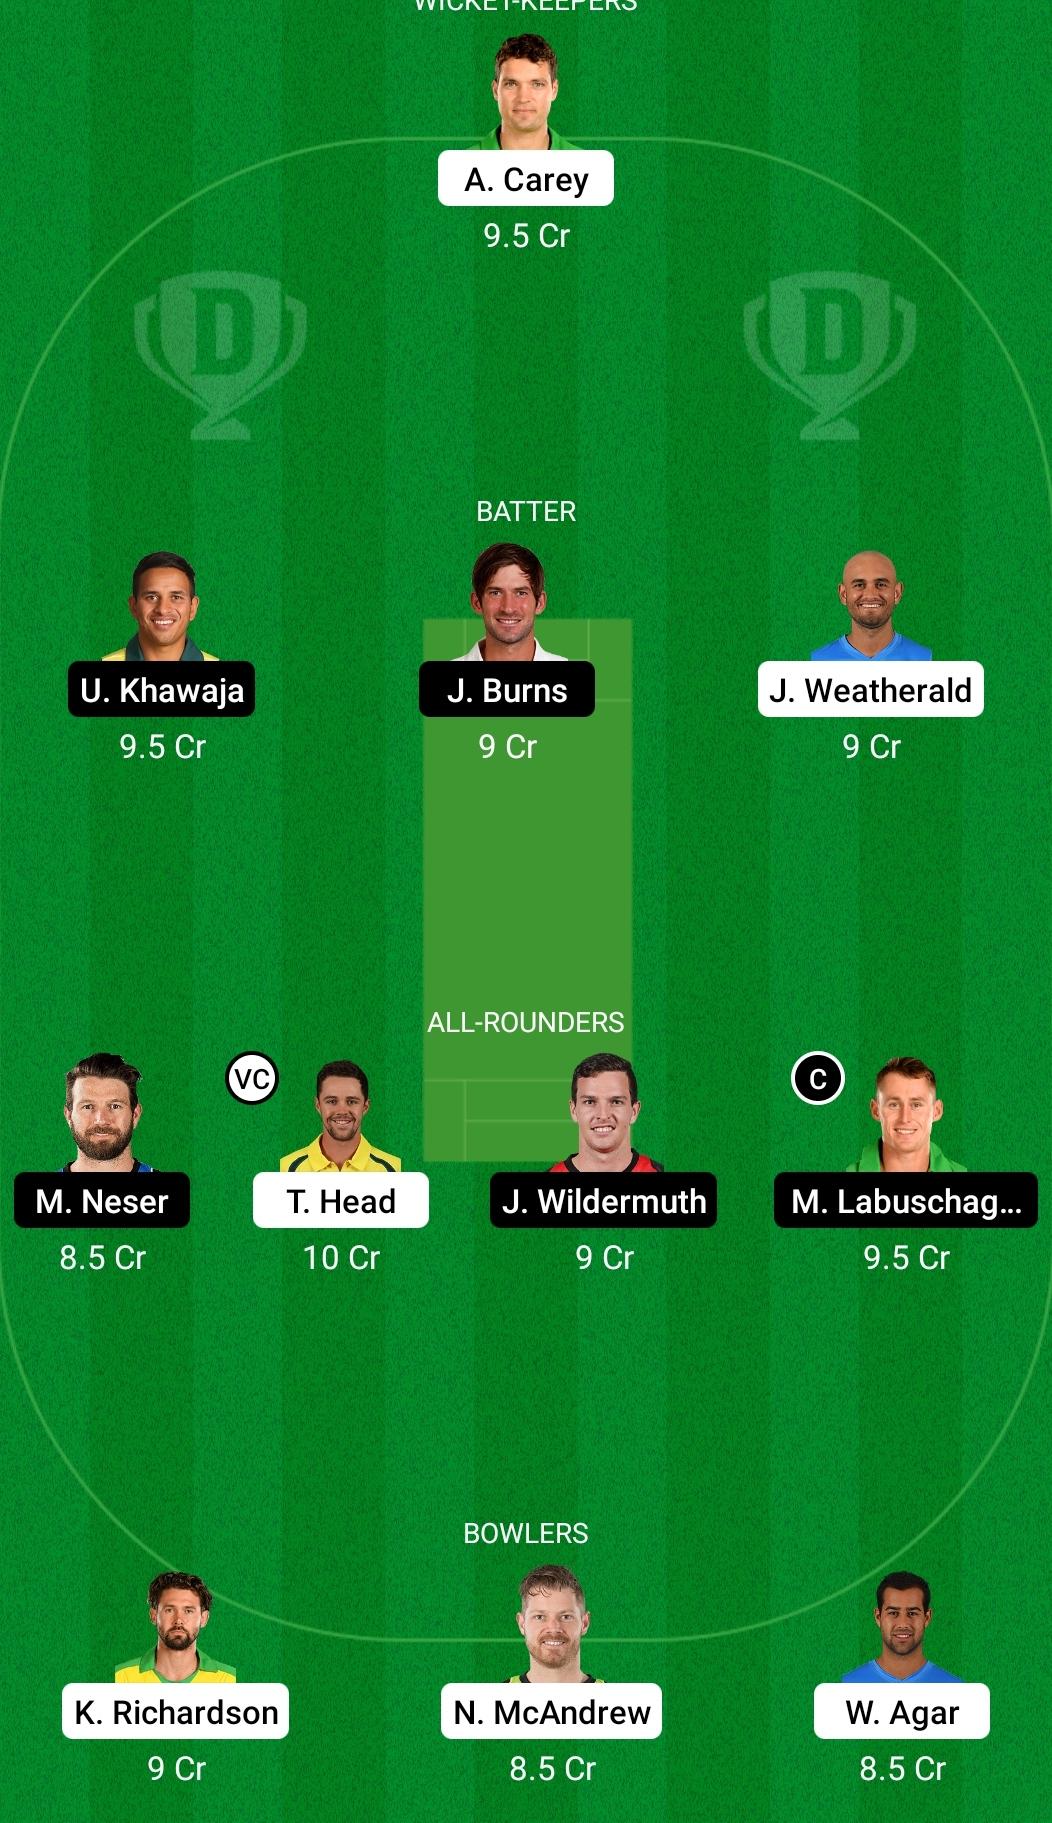 एसएयू बनाम क्यूएन ड्रीम11 प्रेडिक्शन फैंटेसी क्रिकेट टिप्स ड्रीम11 टीम ऑस्ट्रेलियन वन-डे कप